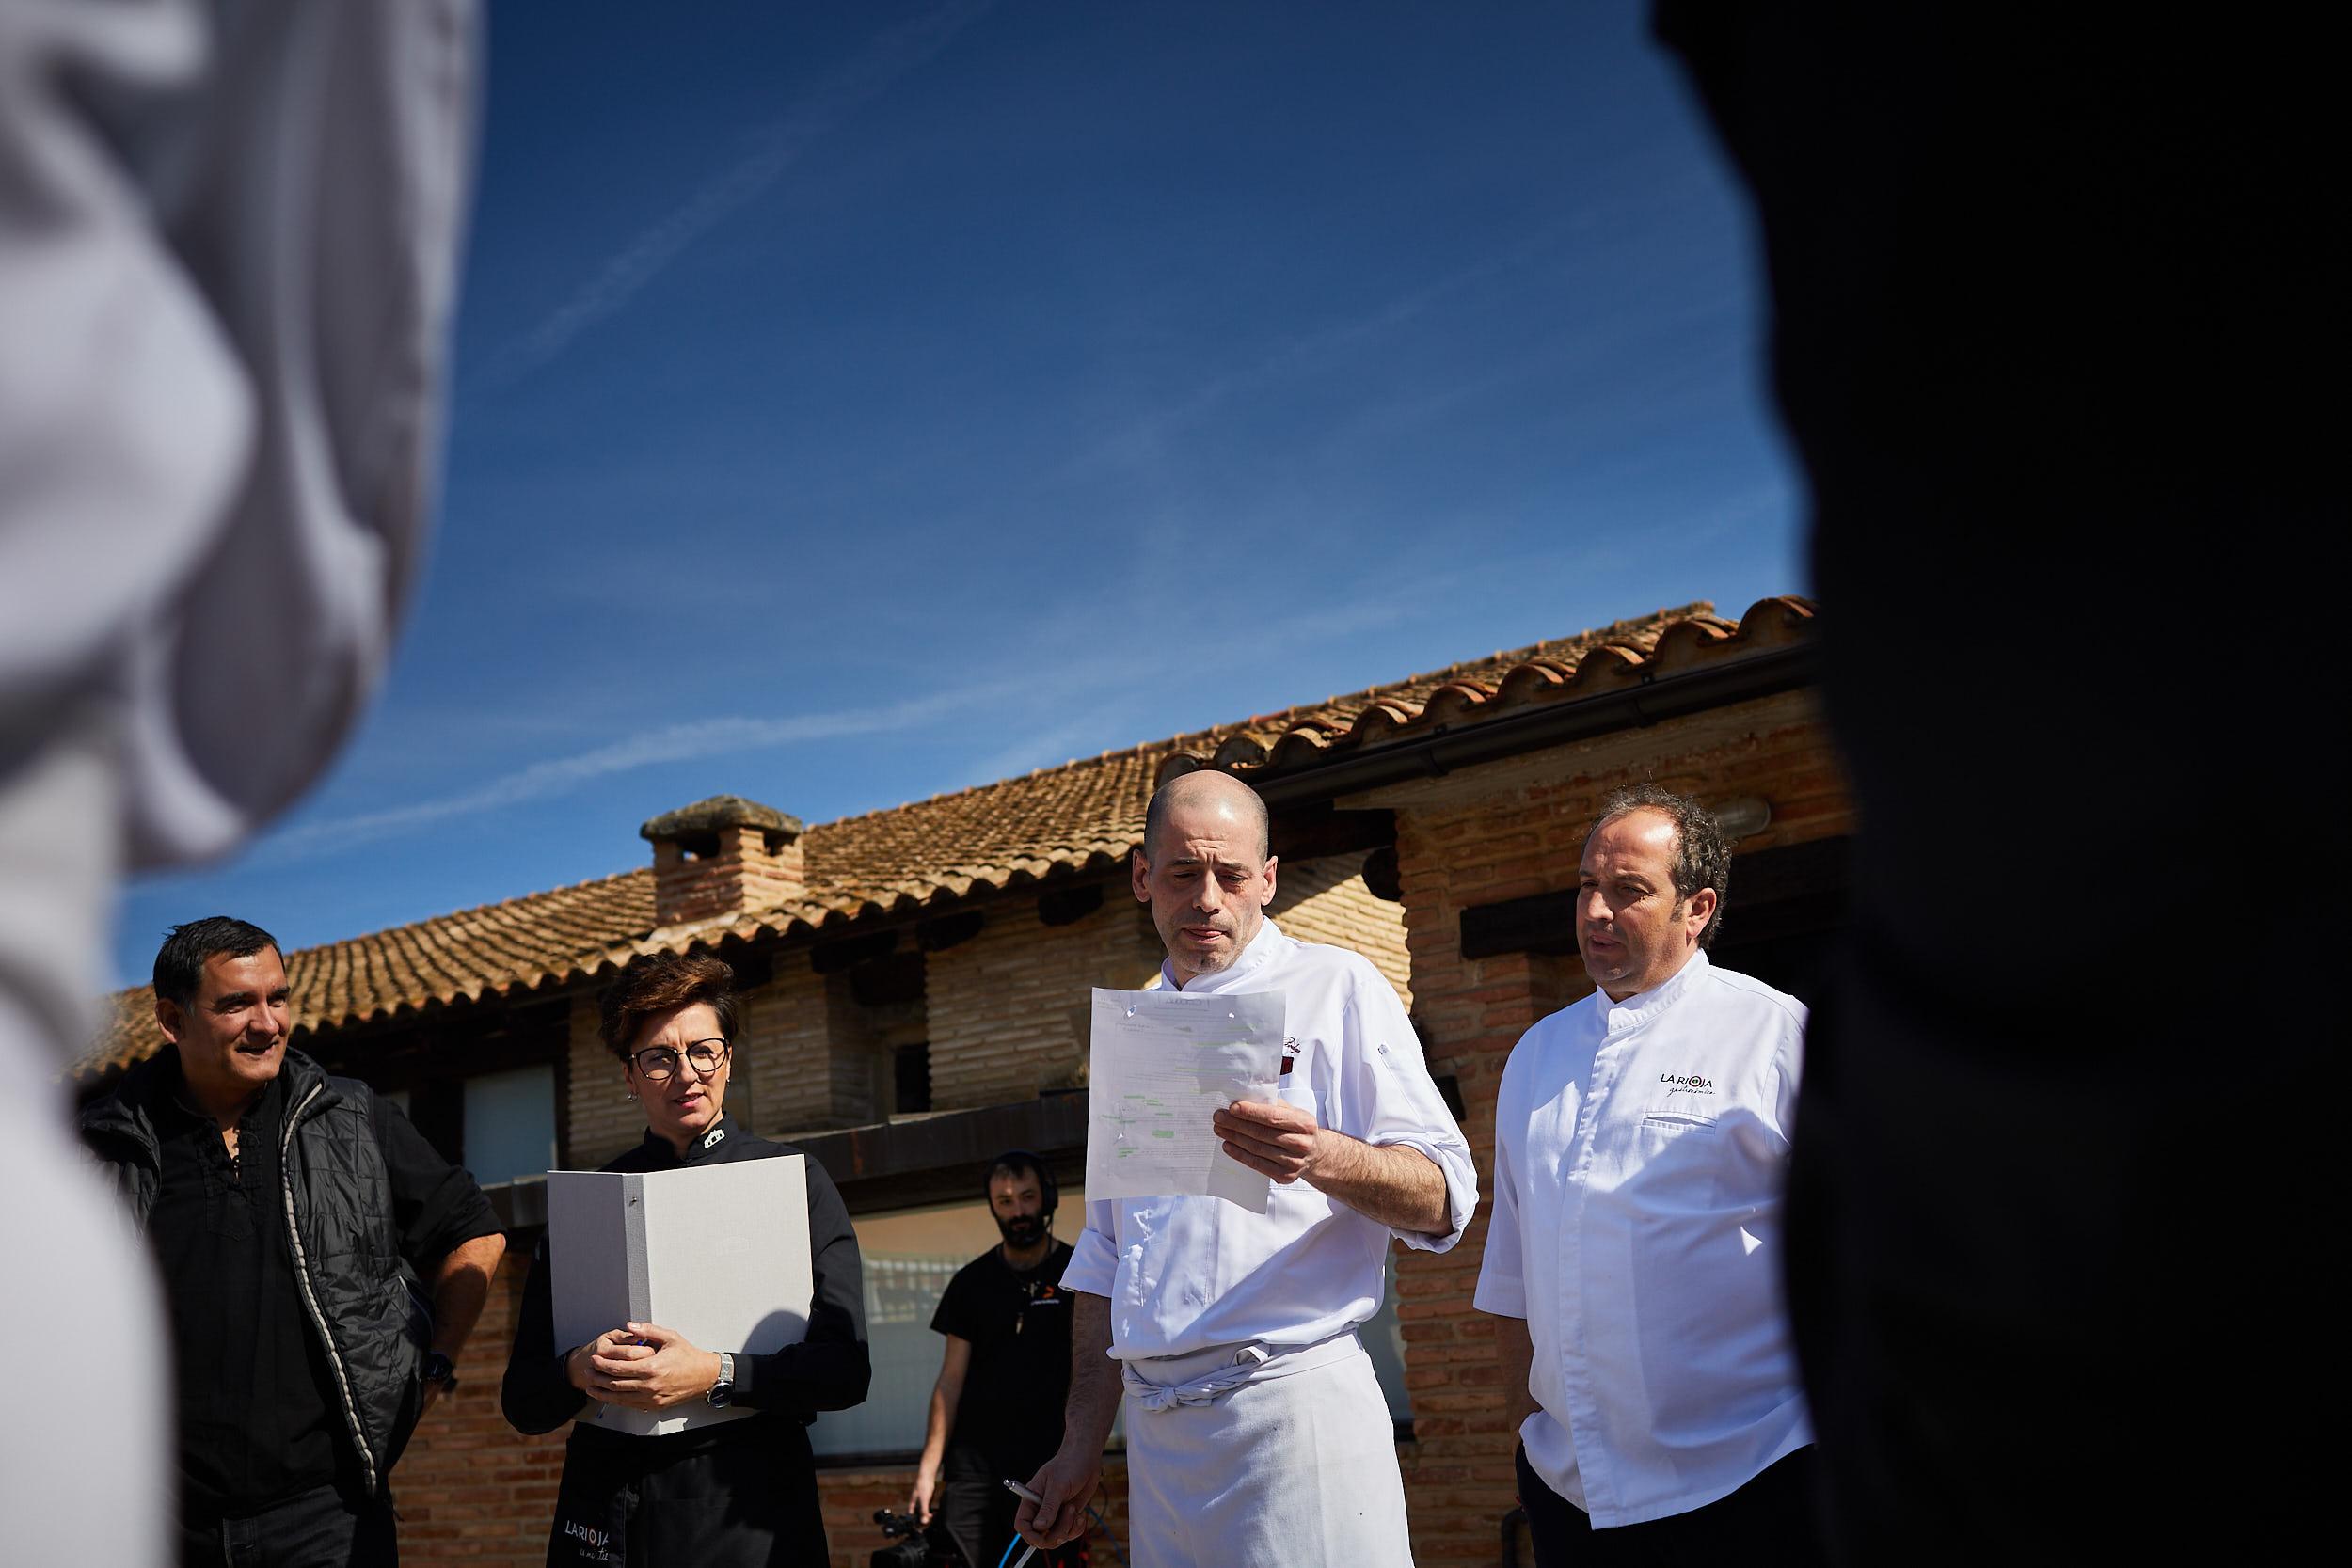 1903Restaurante_La_Vieja_Bodega_Casalarreina_La_Rioja_Spain_Sturcke_0001.jpg